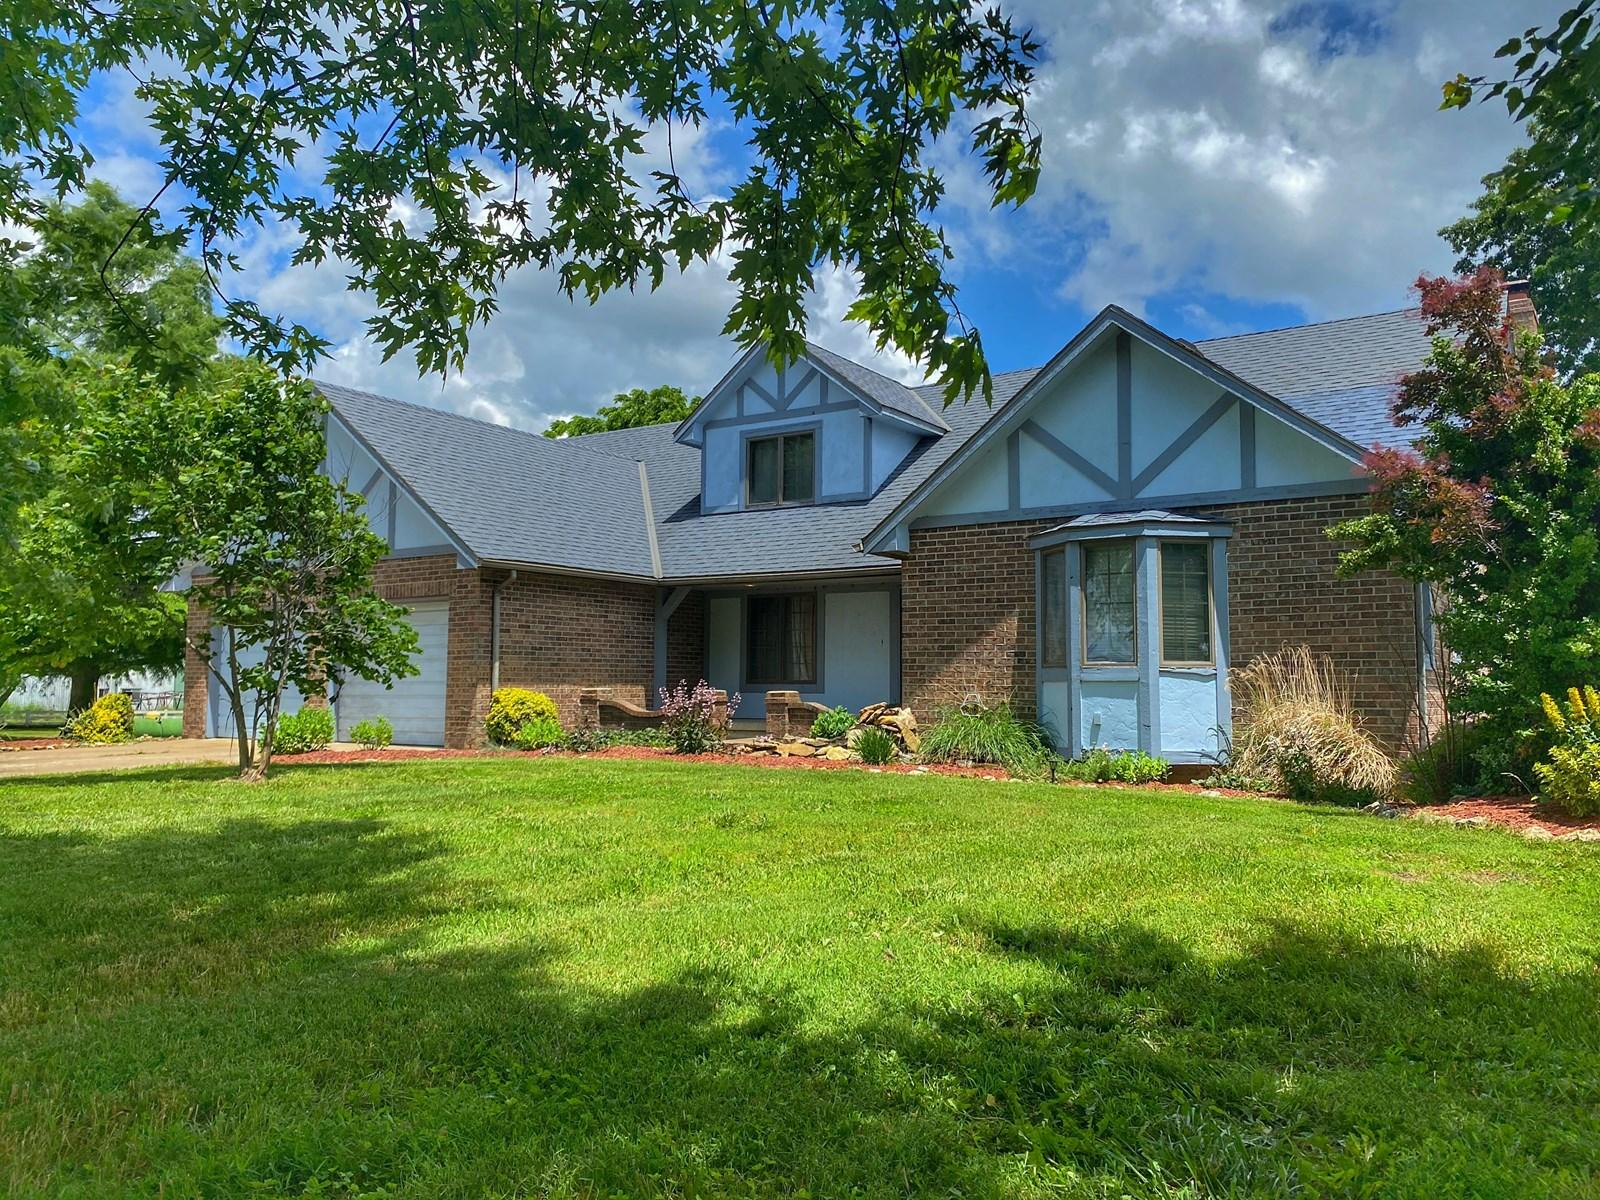 Home for sale Butler, MO